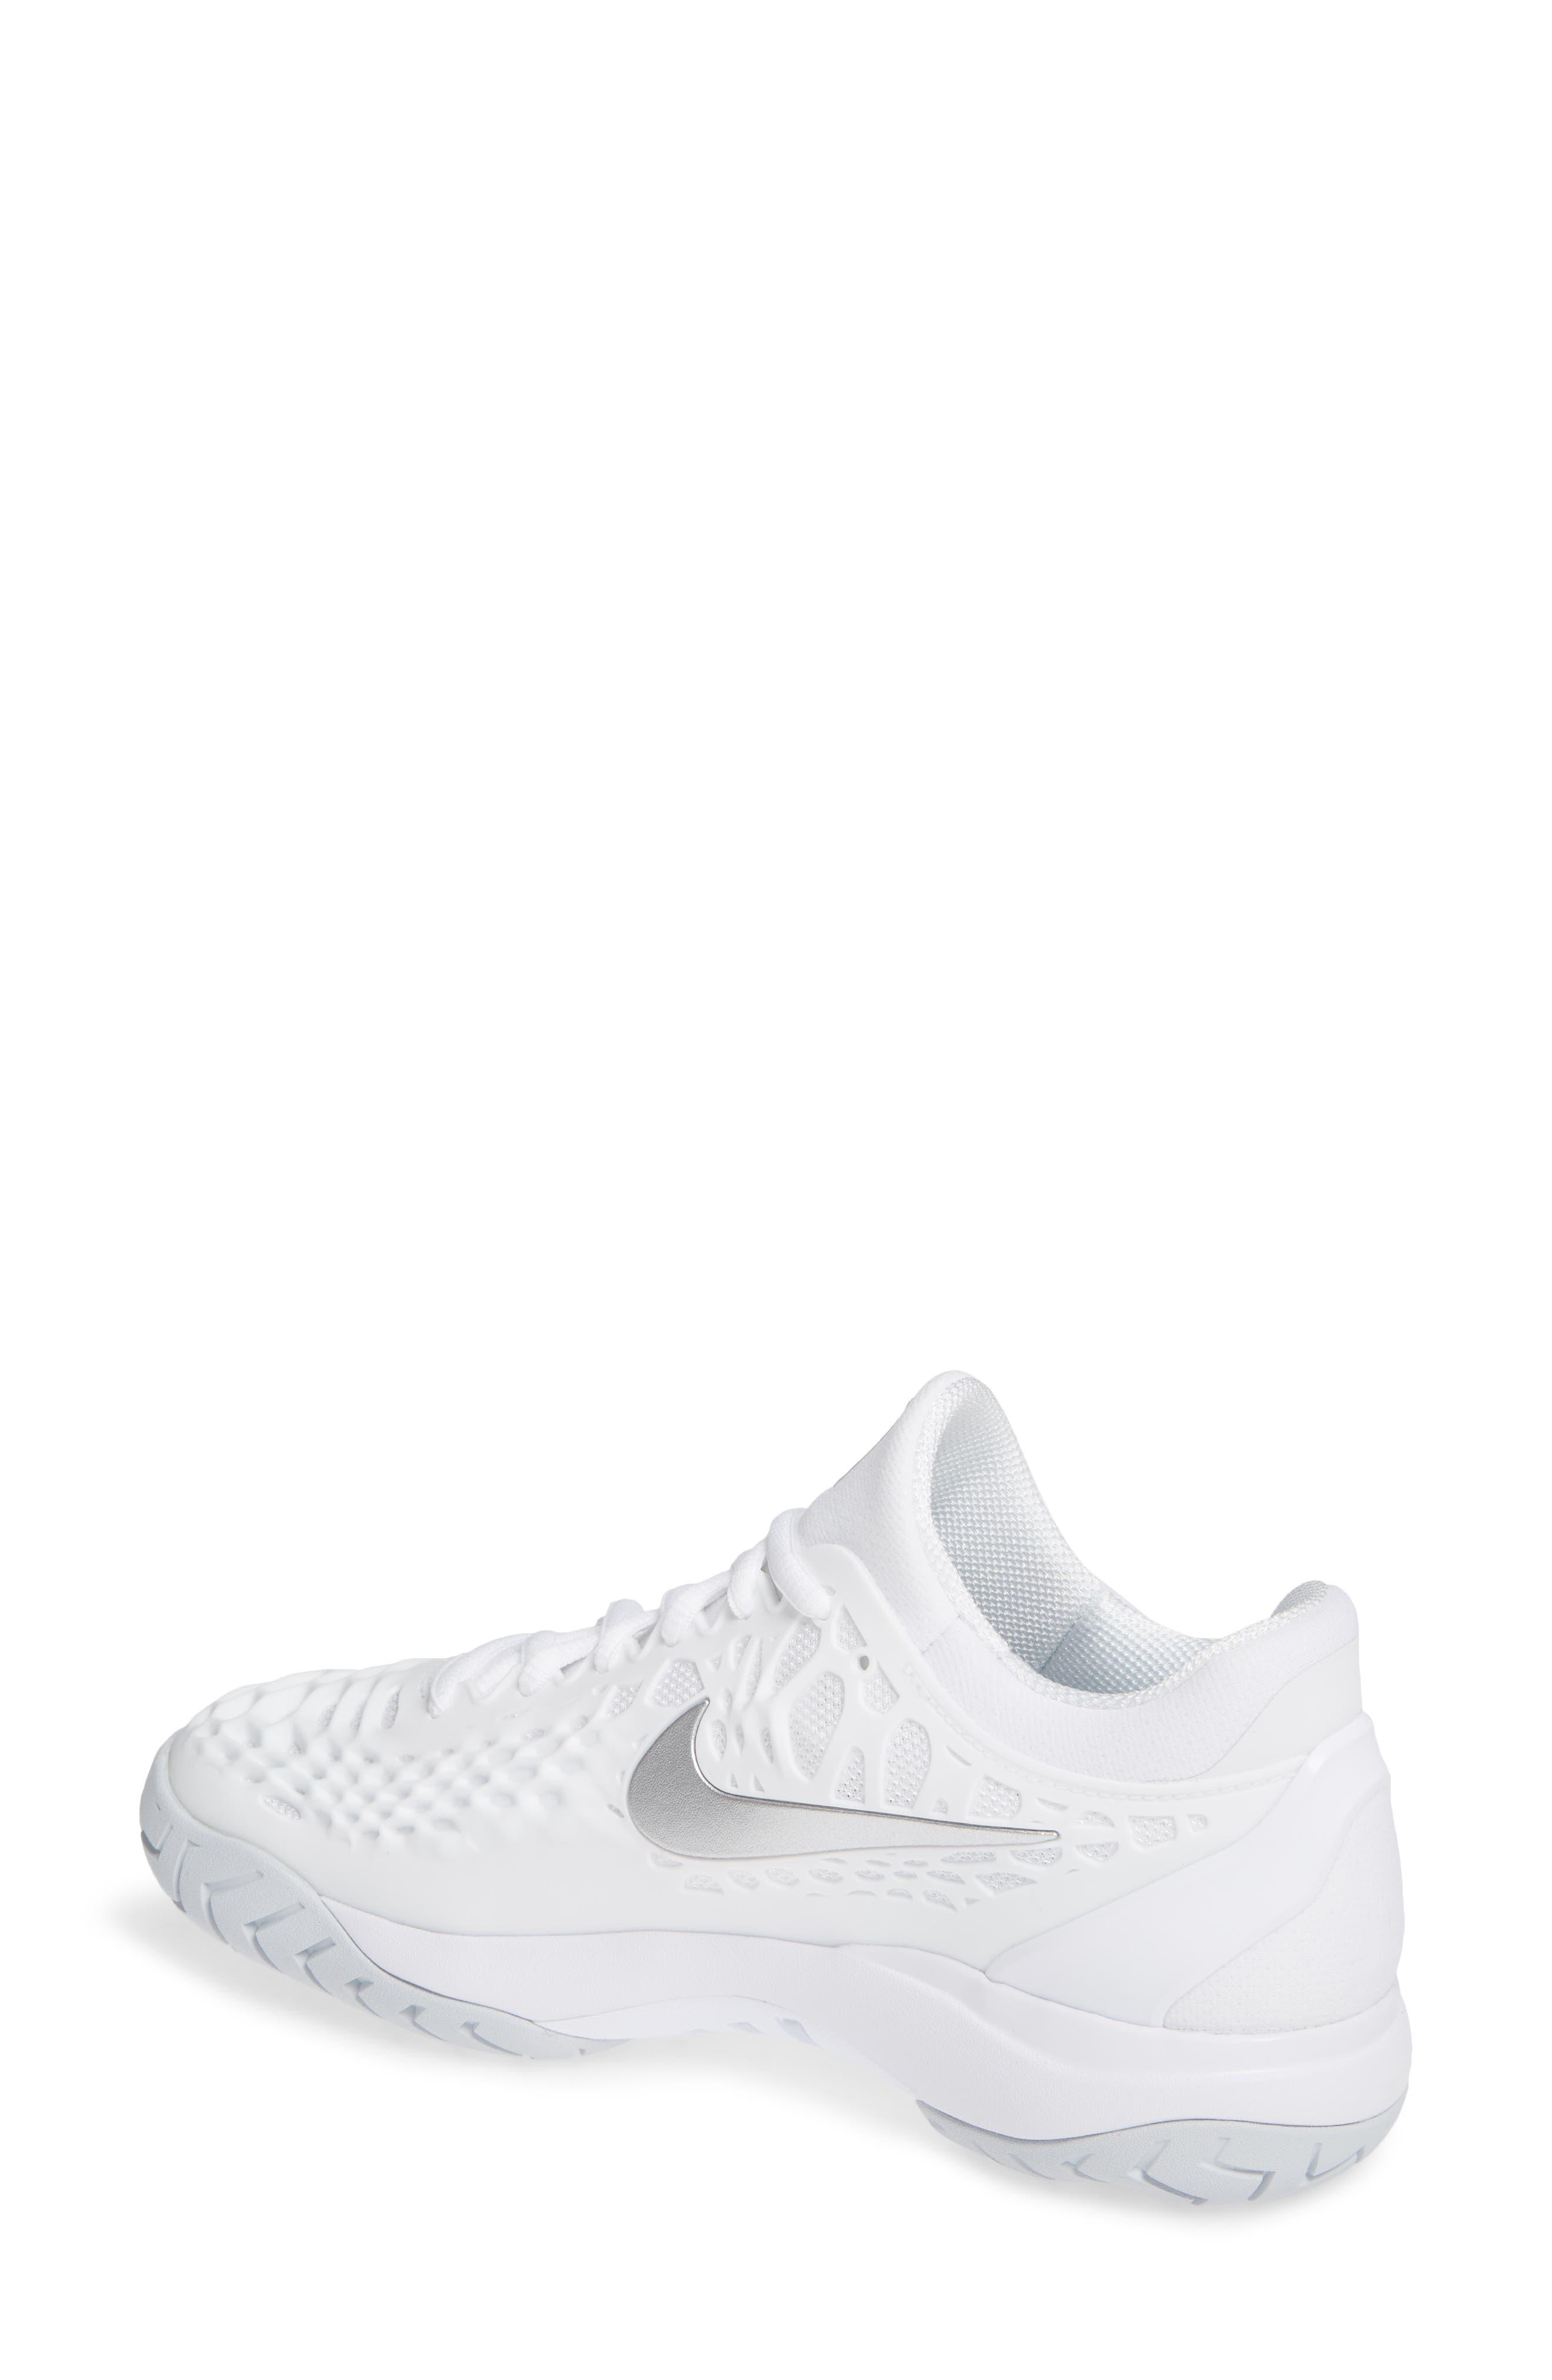 Air Zoom Cage 3 HC Tennis Shoe,                             Alternate thumbnail 2, color,                             WHITE/ SILVER/ PLATINUM